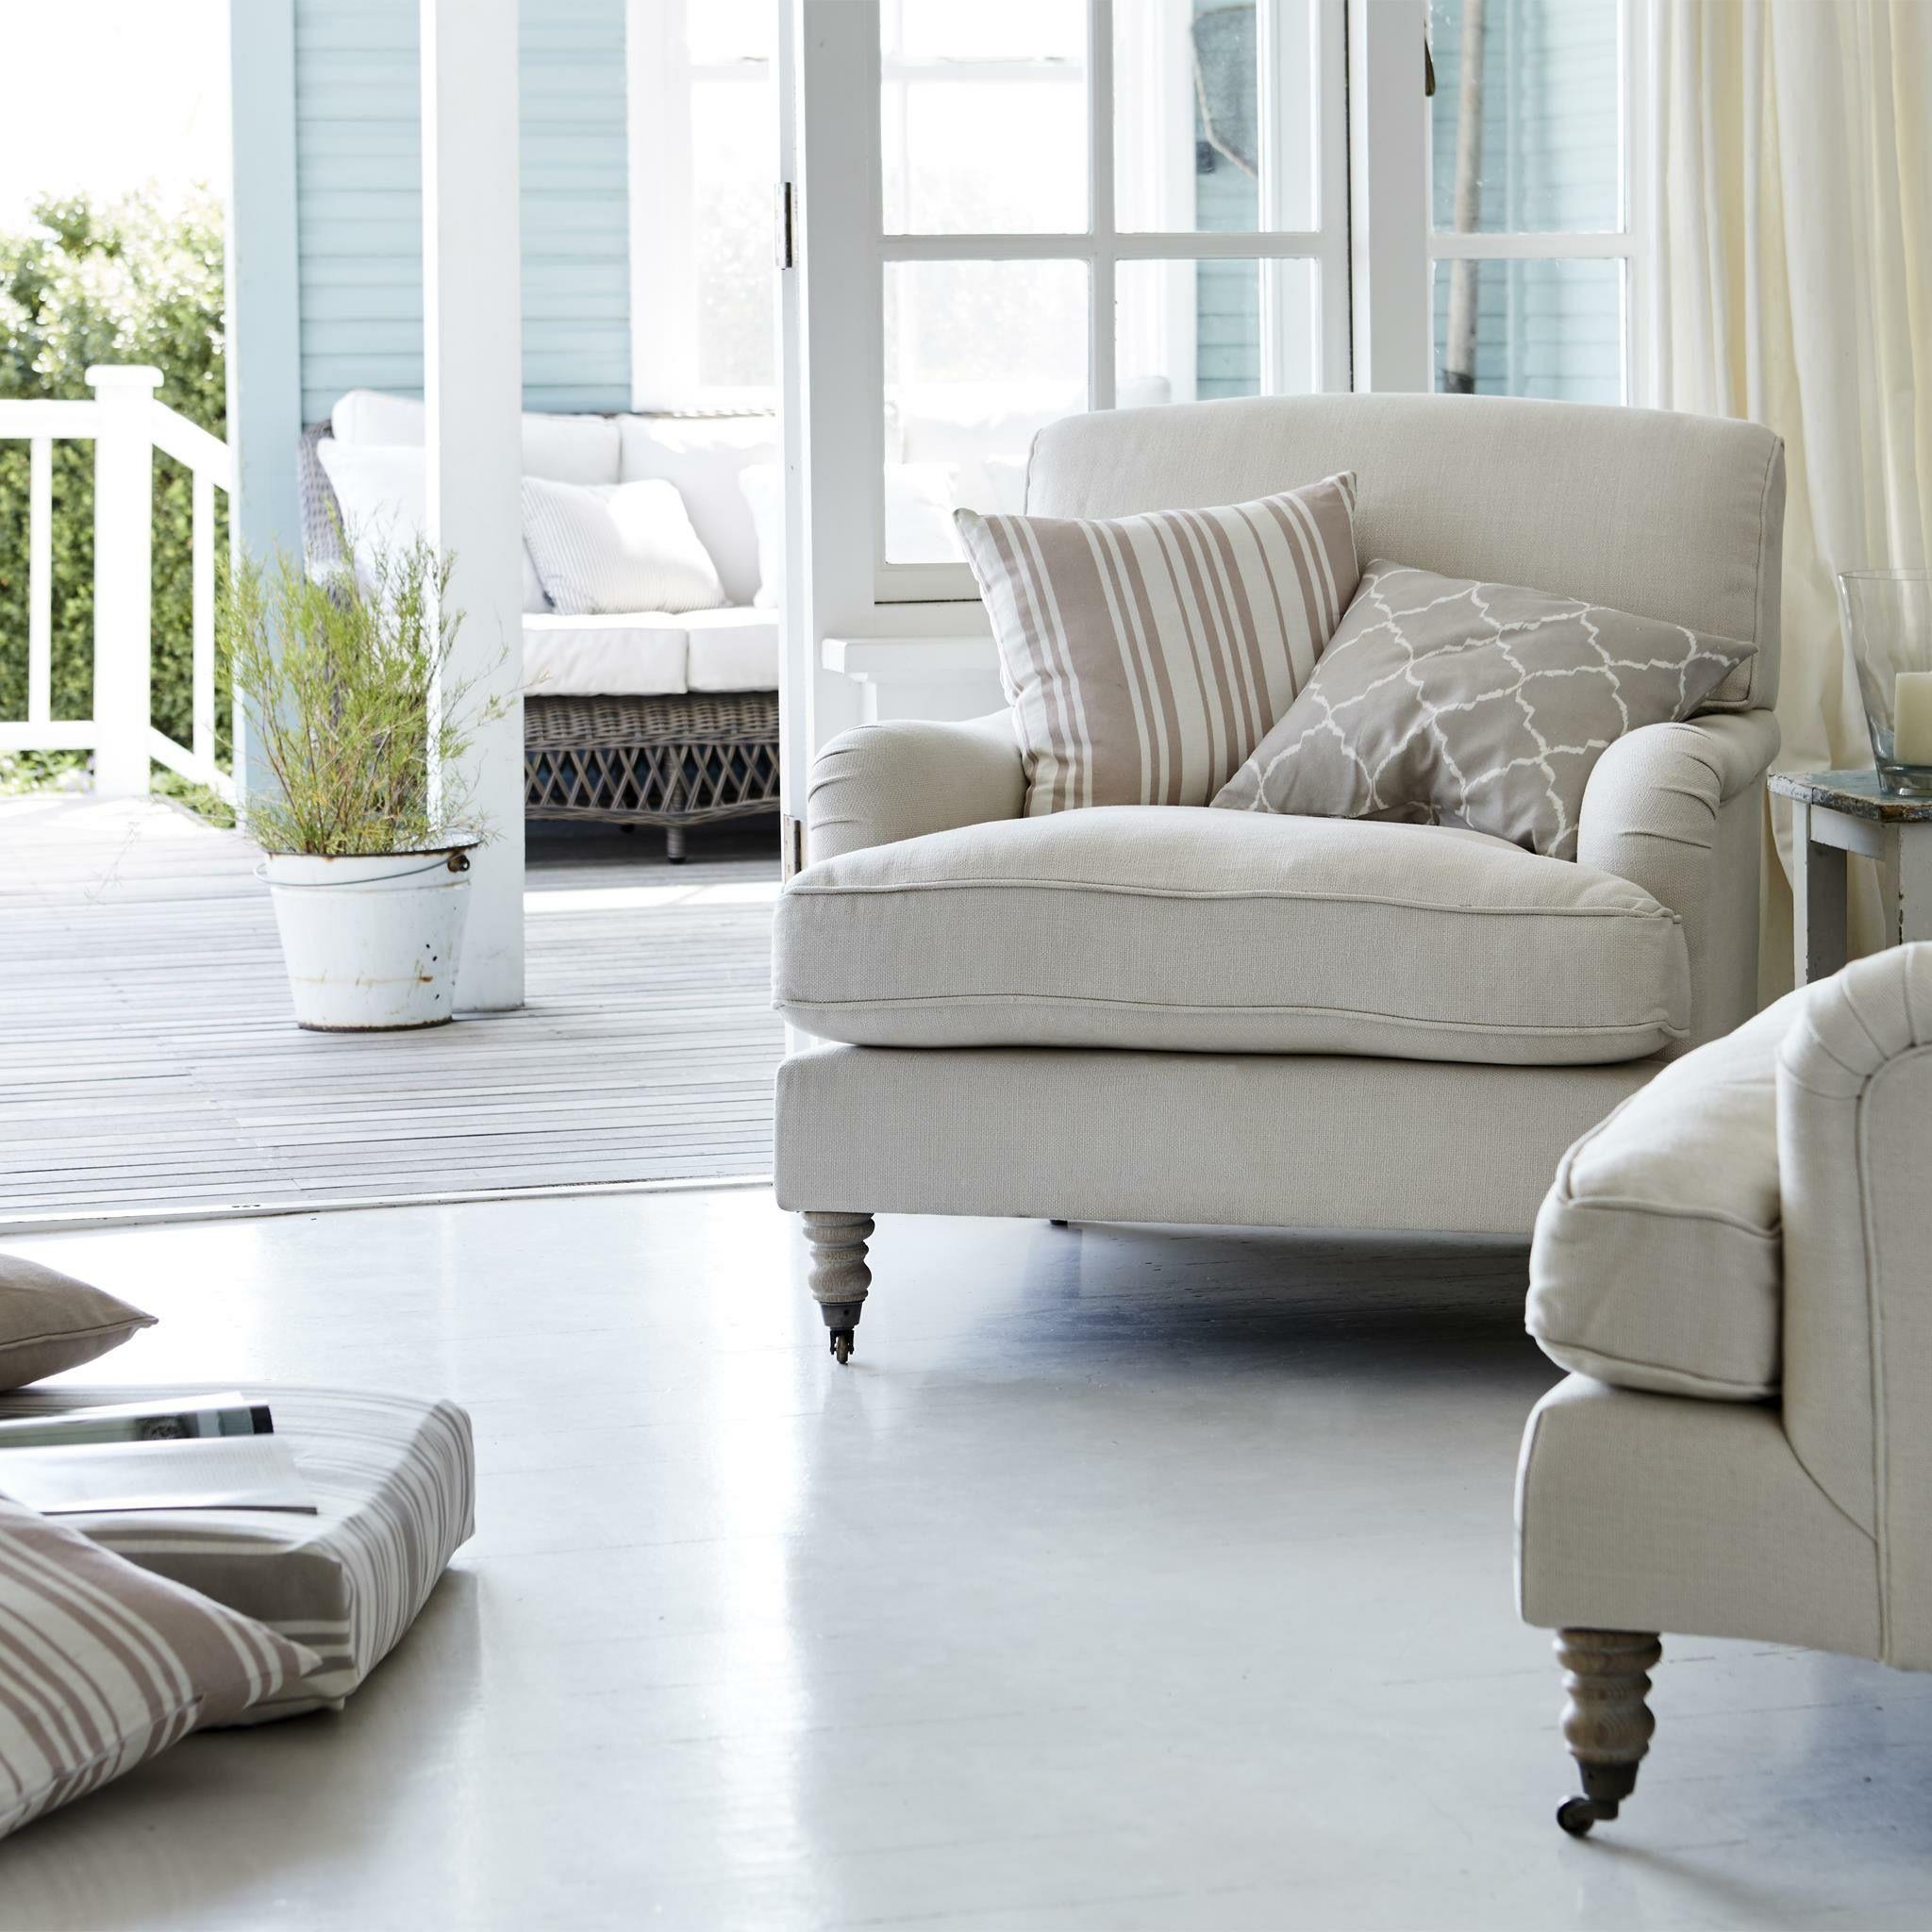 pinangela kedgley on sofas chairs and mirrors etc